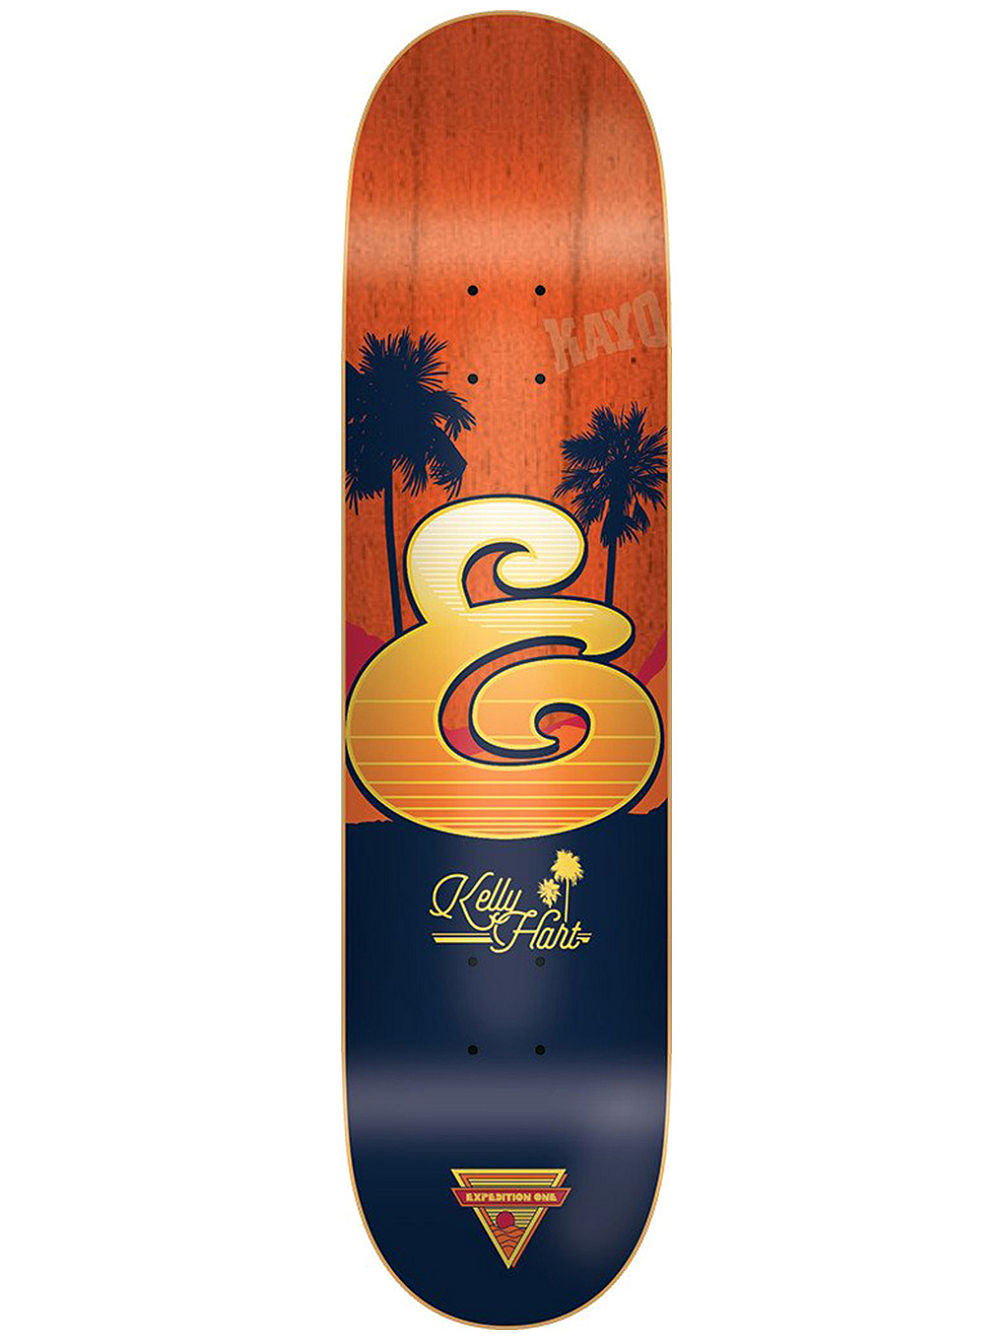 expedition-hart-coastal-806-skateboard-deck